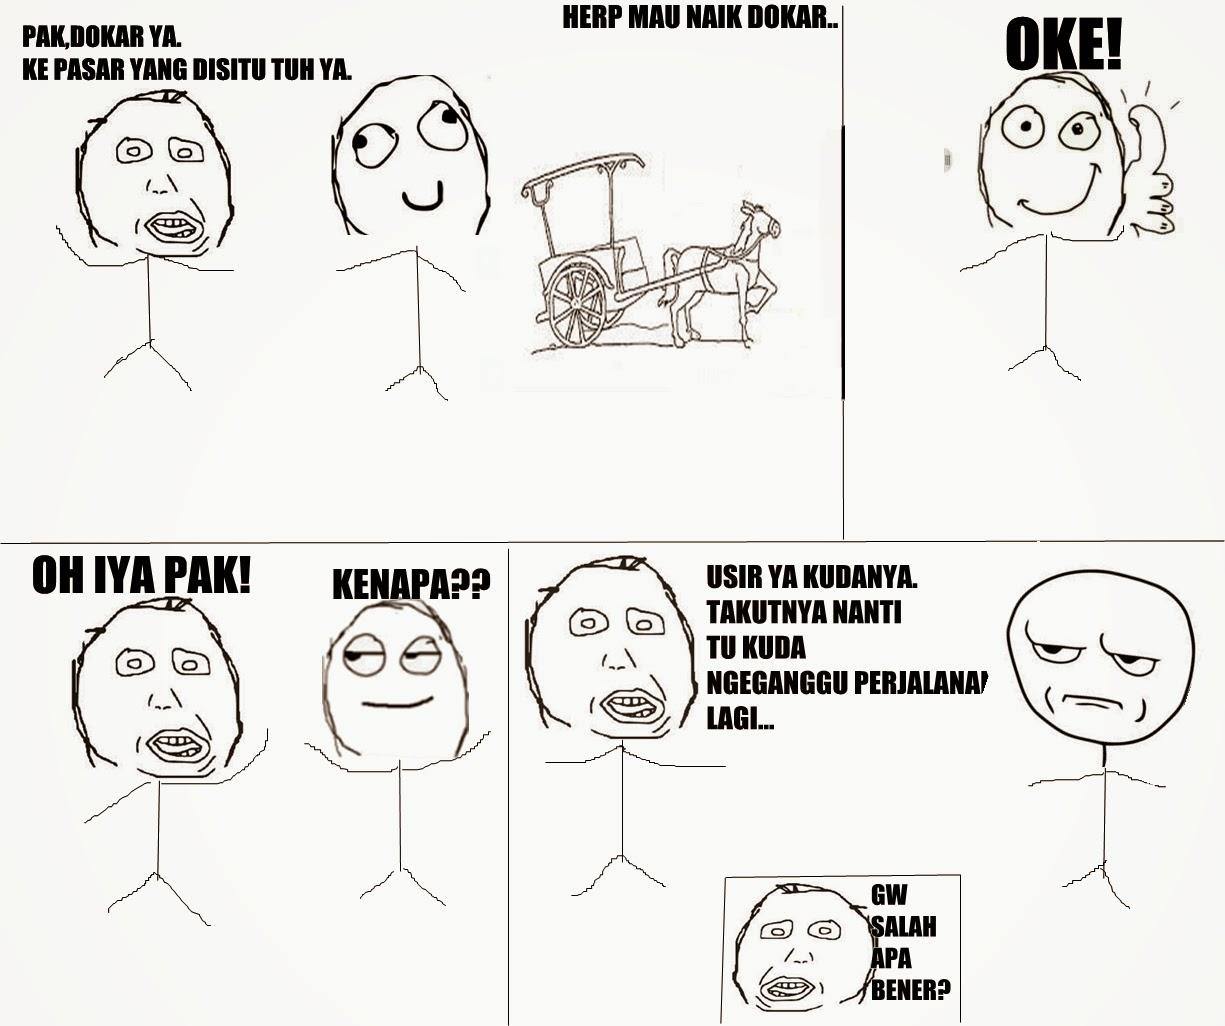 Koleksi Kumpulan Gambar Meme Comic Herp Gambar Meme